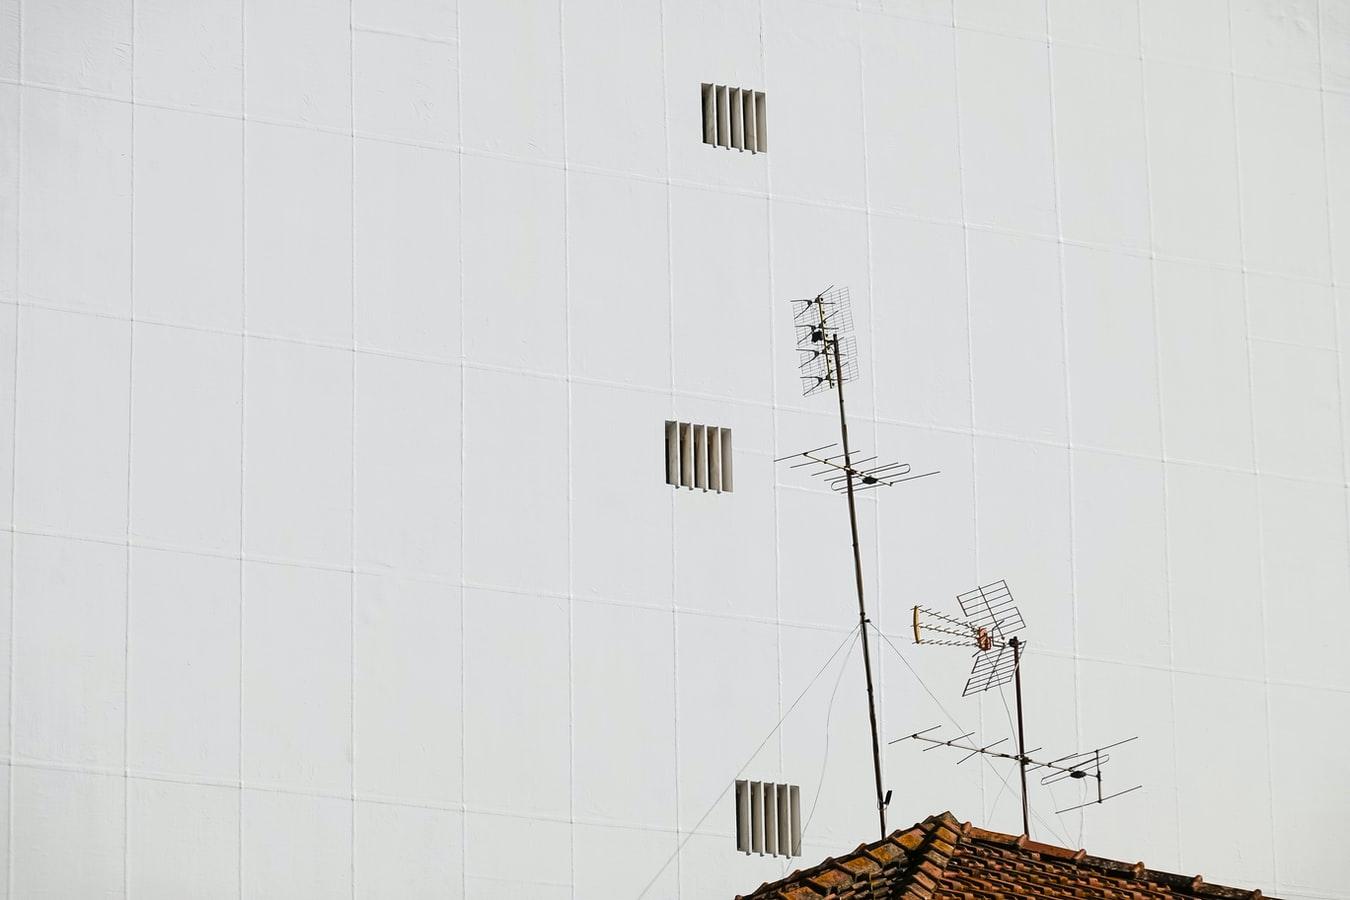 montare antenna tv